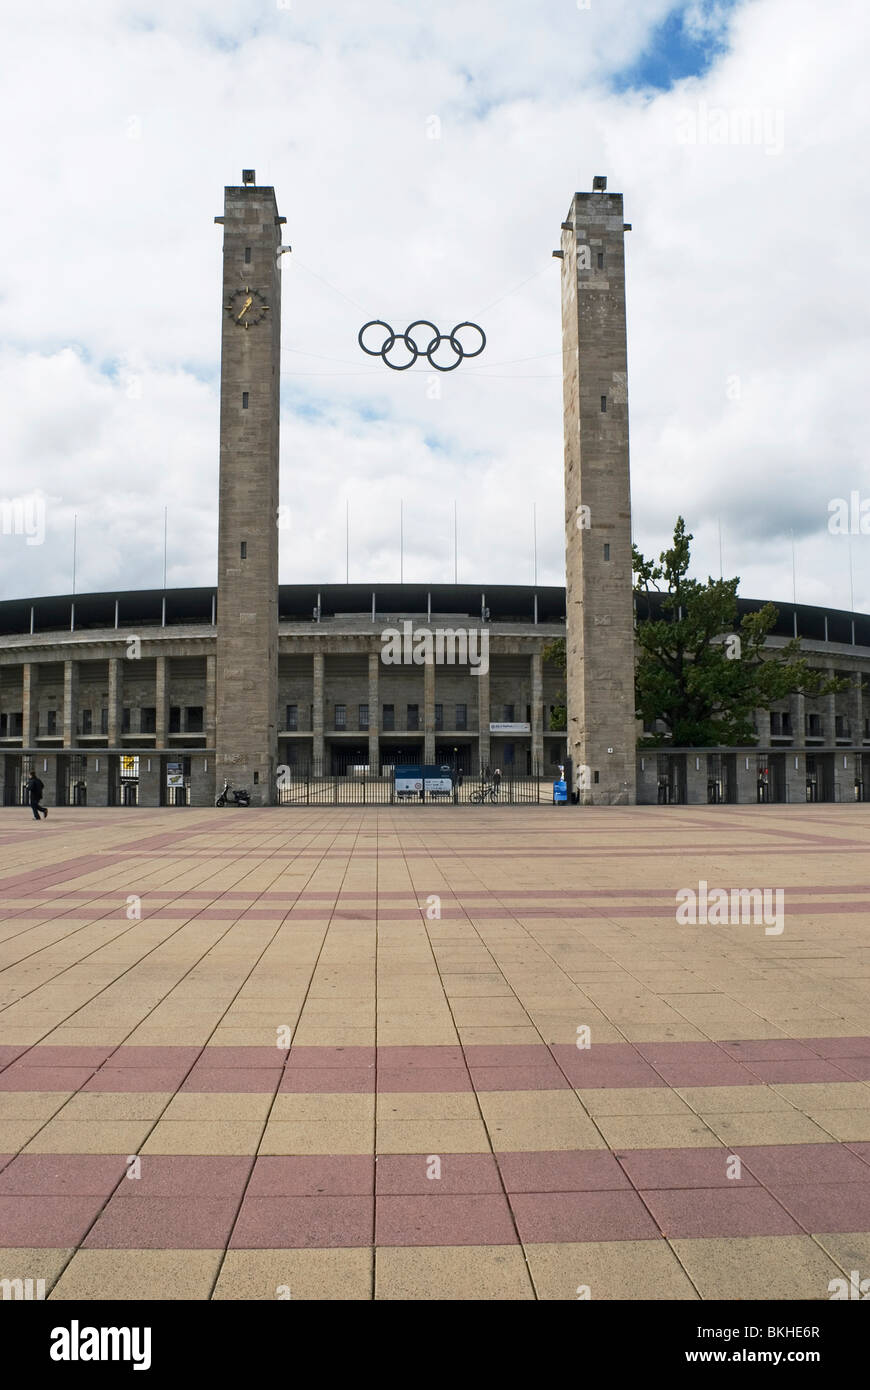 Olympiastadion Olympic Stadium, main entrance, Berlin, Germany - Stock Image